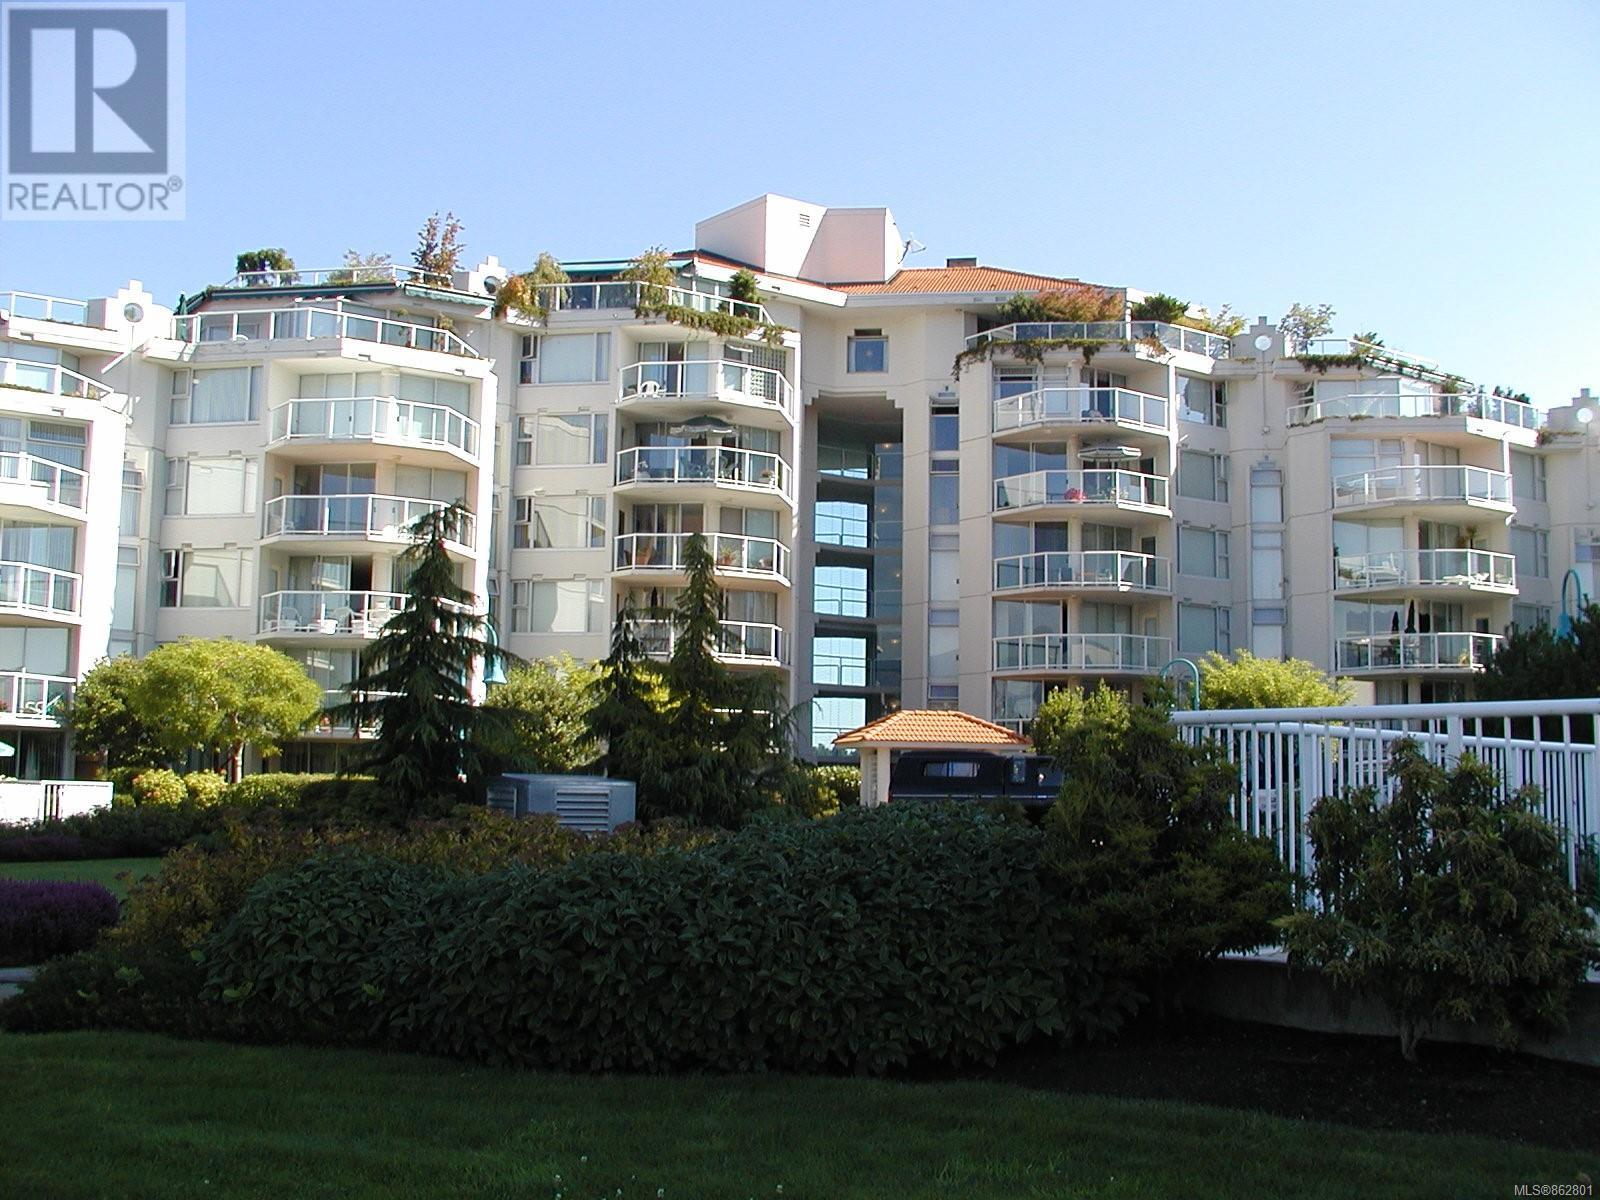 203 150 Promenade Dr, Nanaimo, British Columbia  V9R 6M6 - Photo 23 - 862801